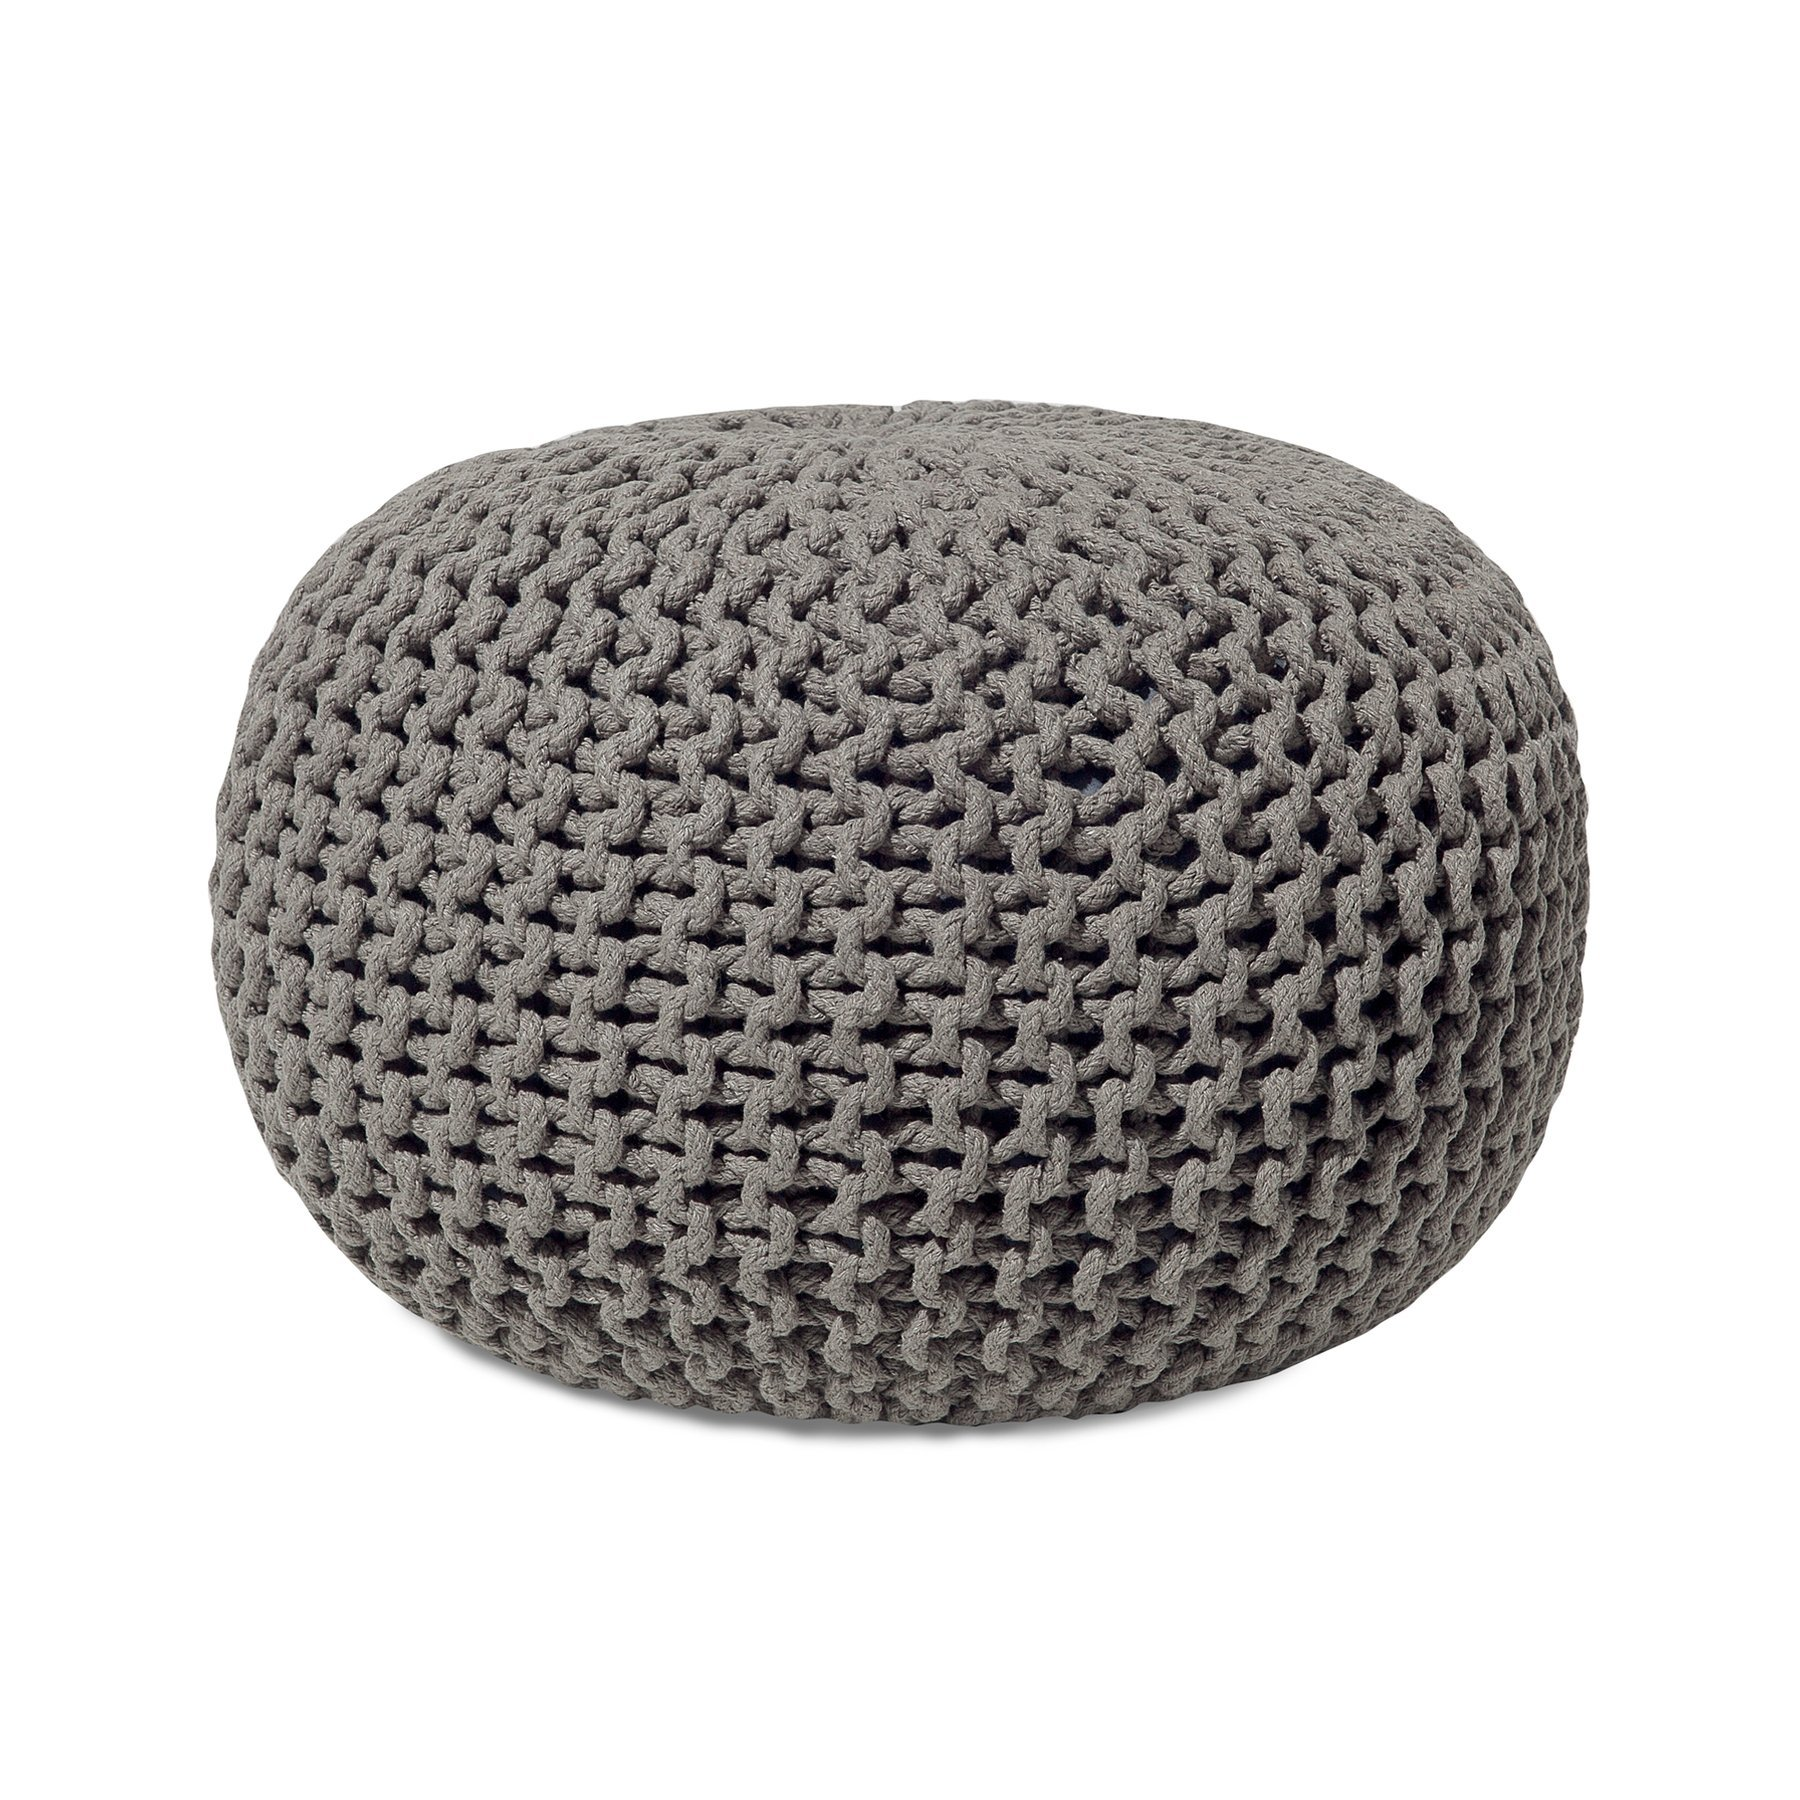 Beliani Modern Knitted Round Pouf Ottoman Soft Cotton Dark Gray 20-inch Conrad